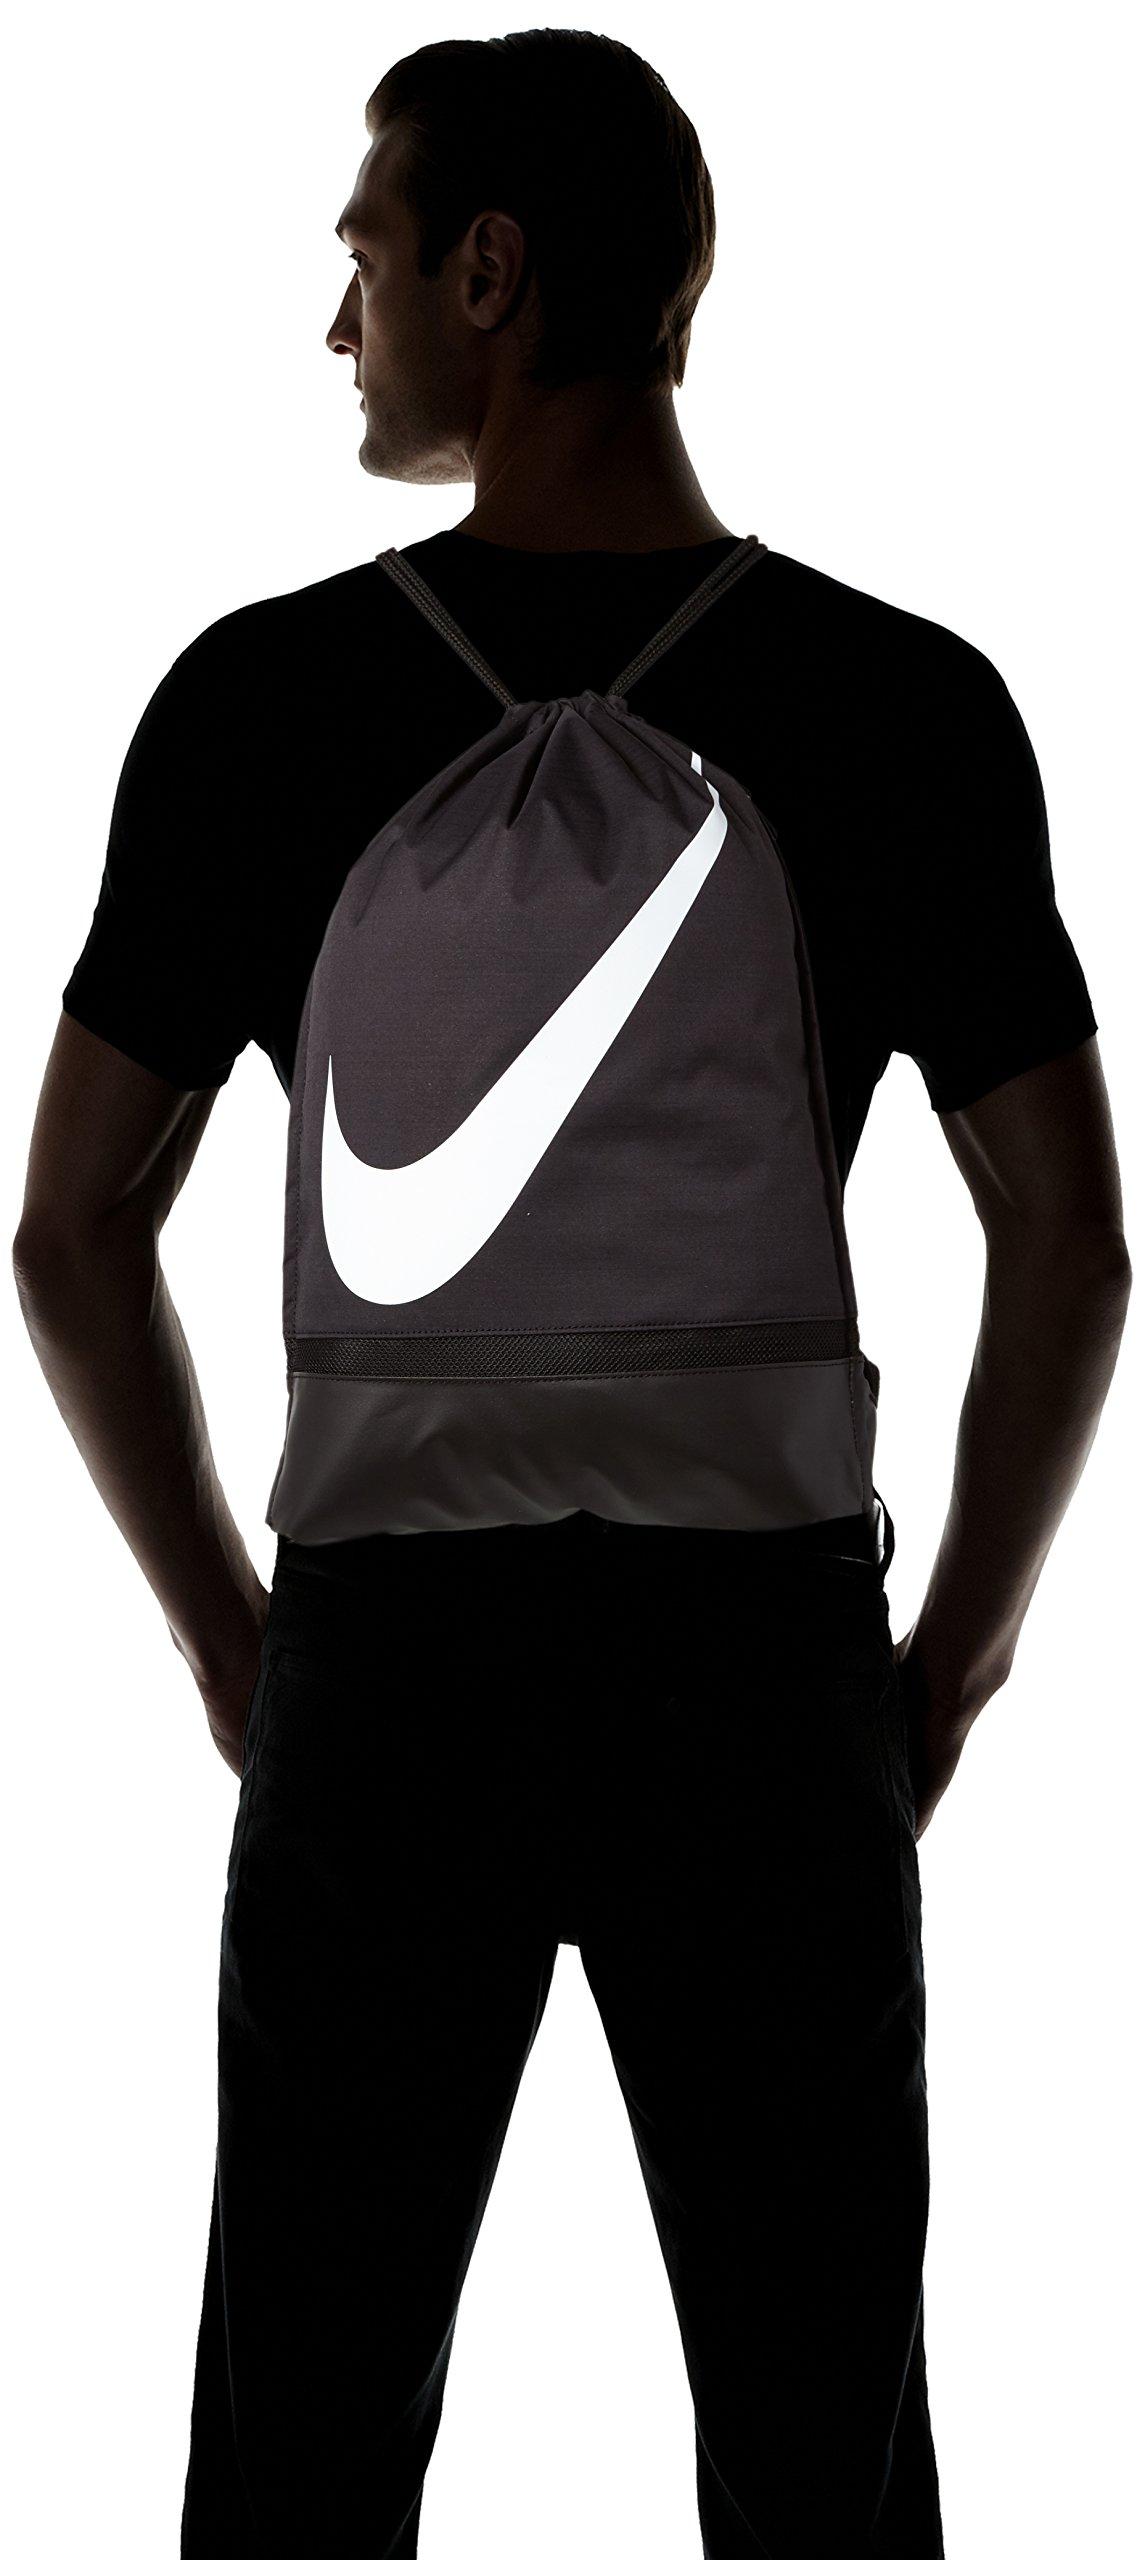 71peguehJRL - Nike Gymsack Entrenamiento Bolsa